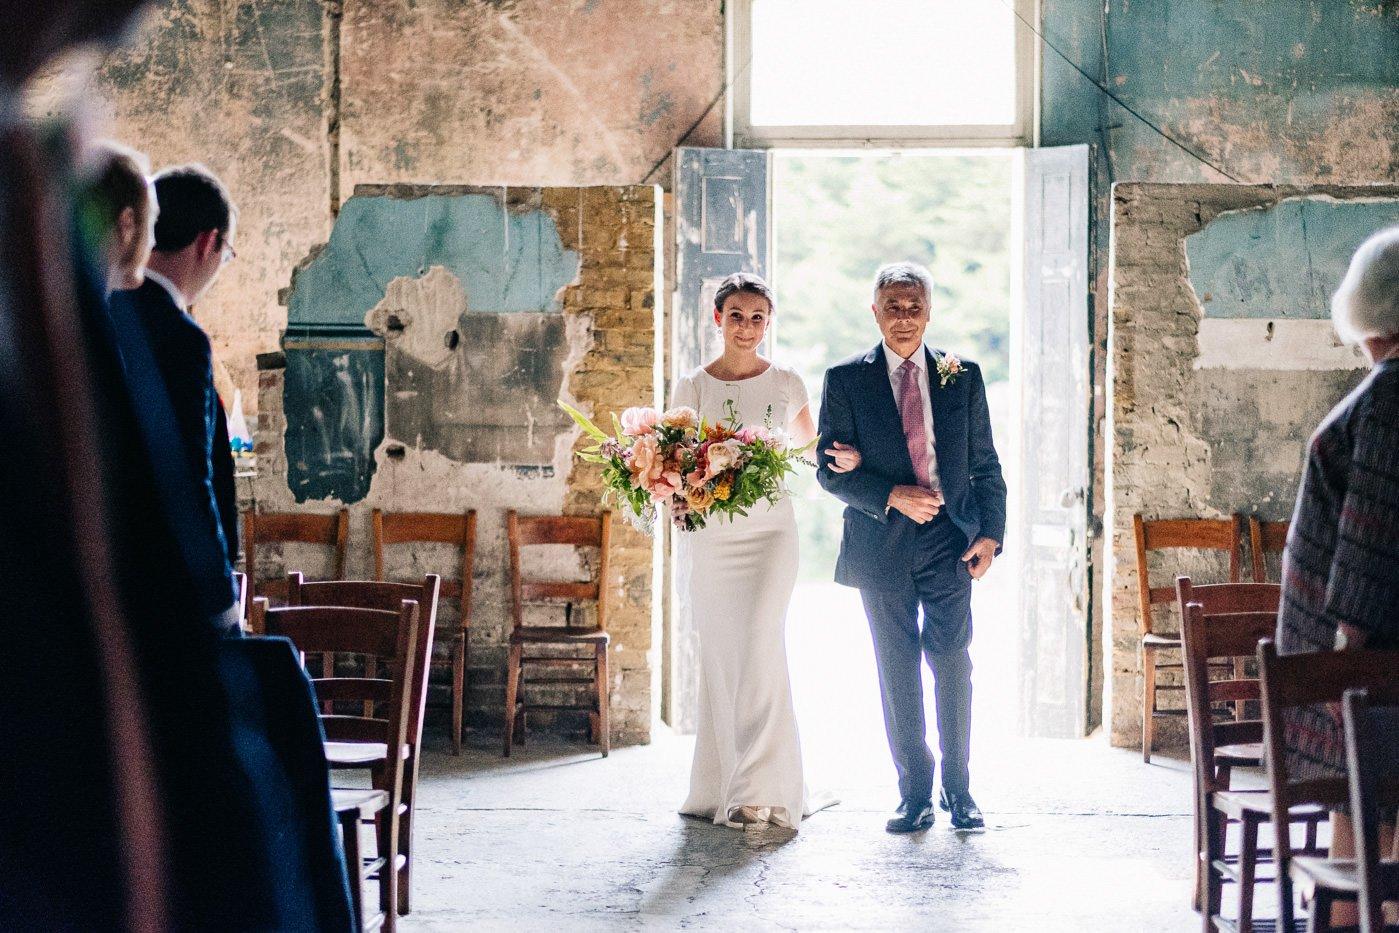 Alternative wedding photographer South London